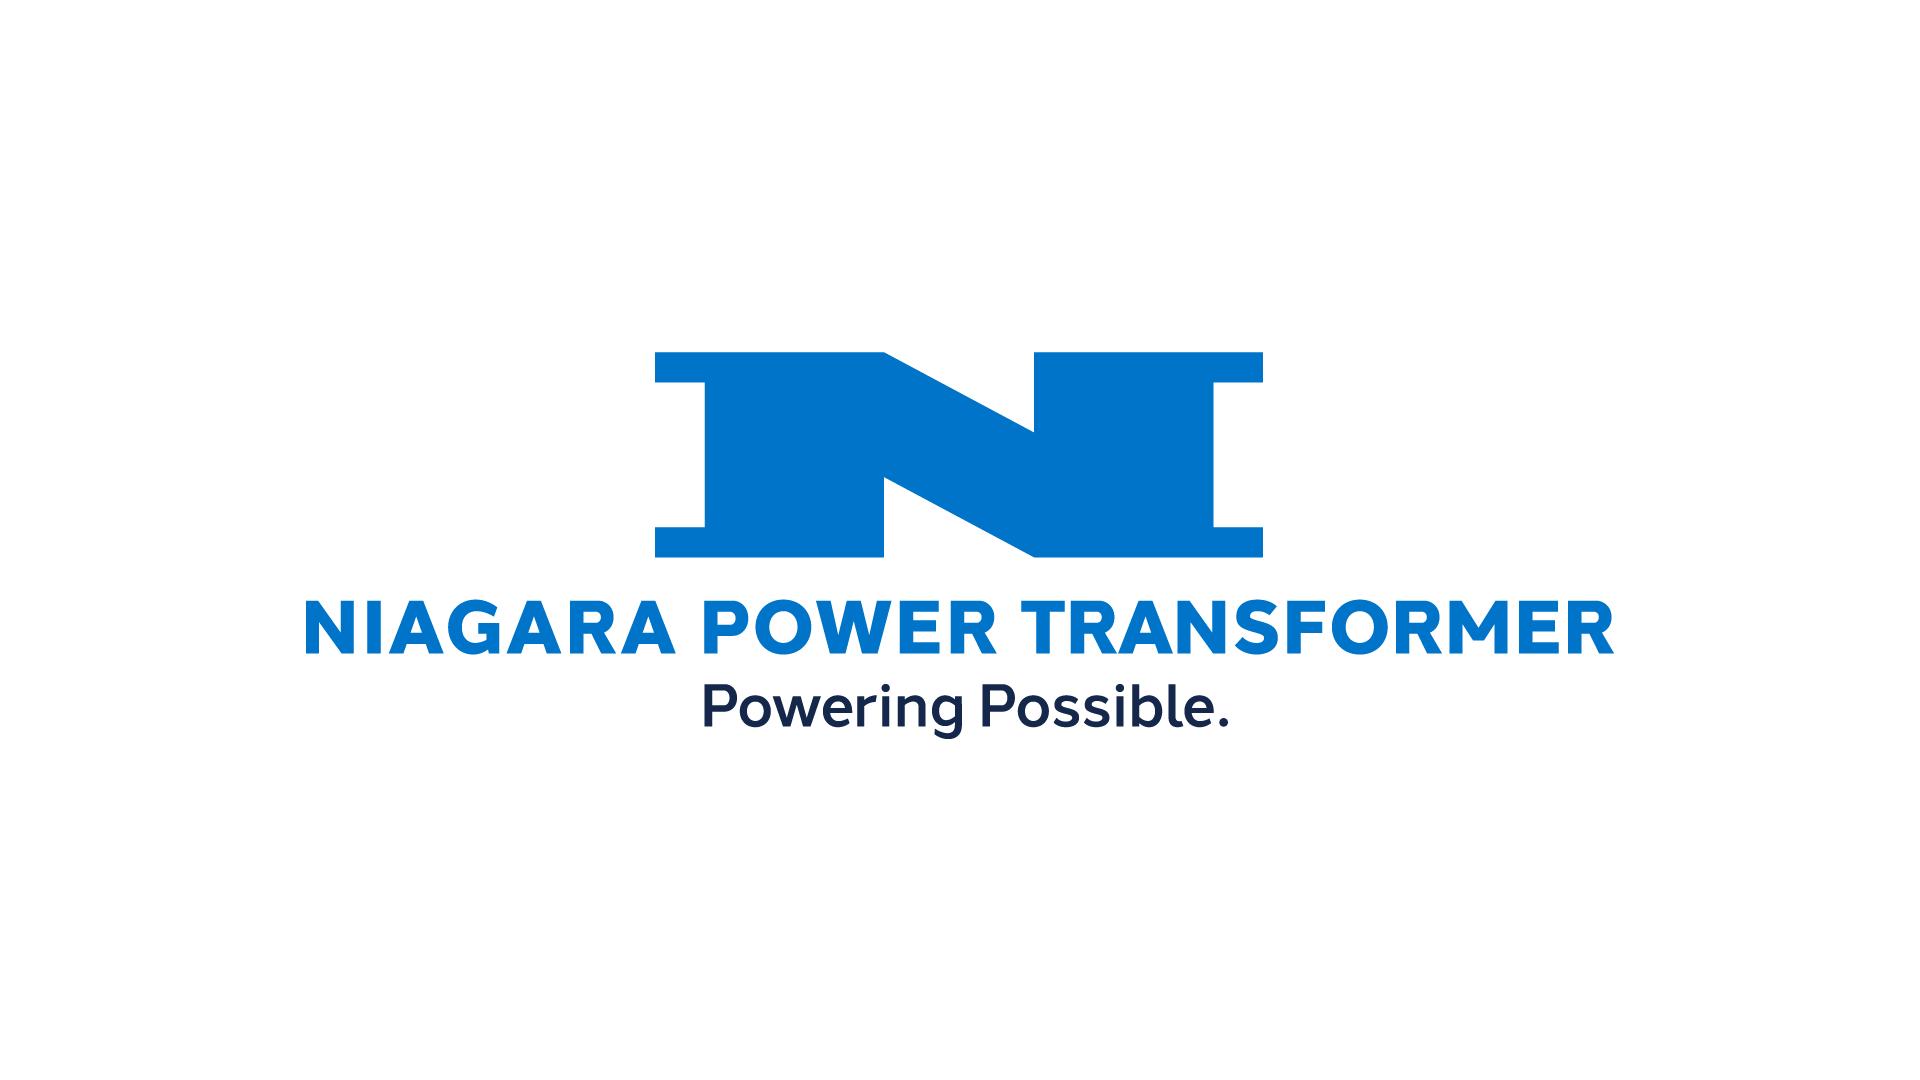 Niagara Power Transformer Logo